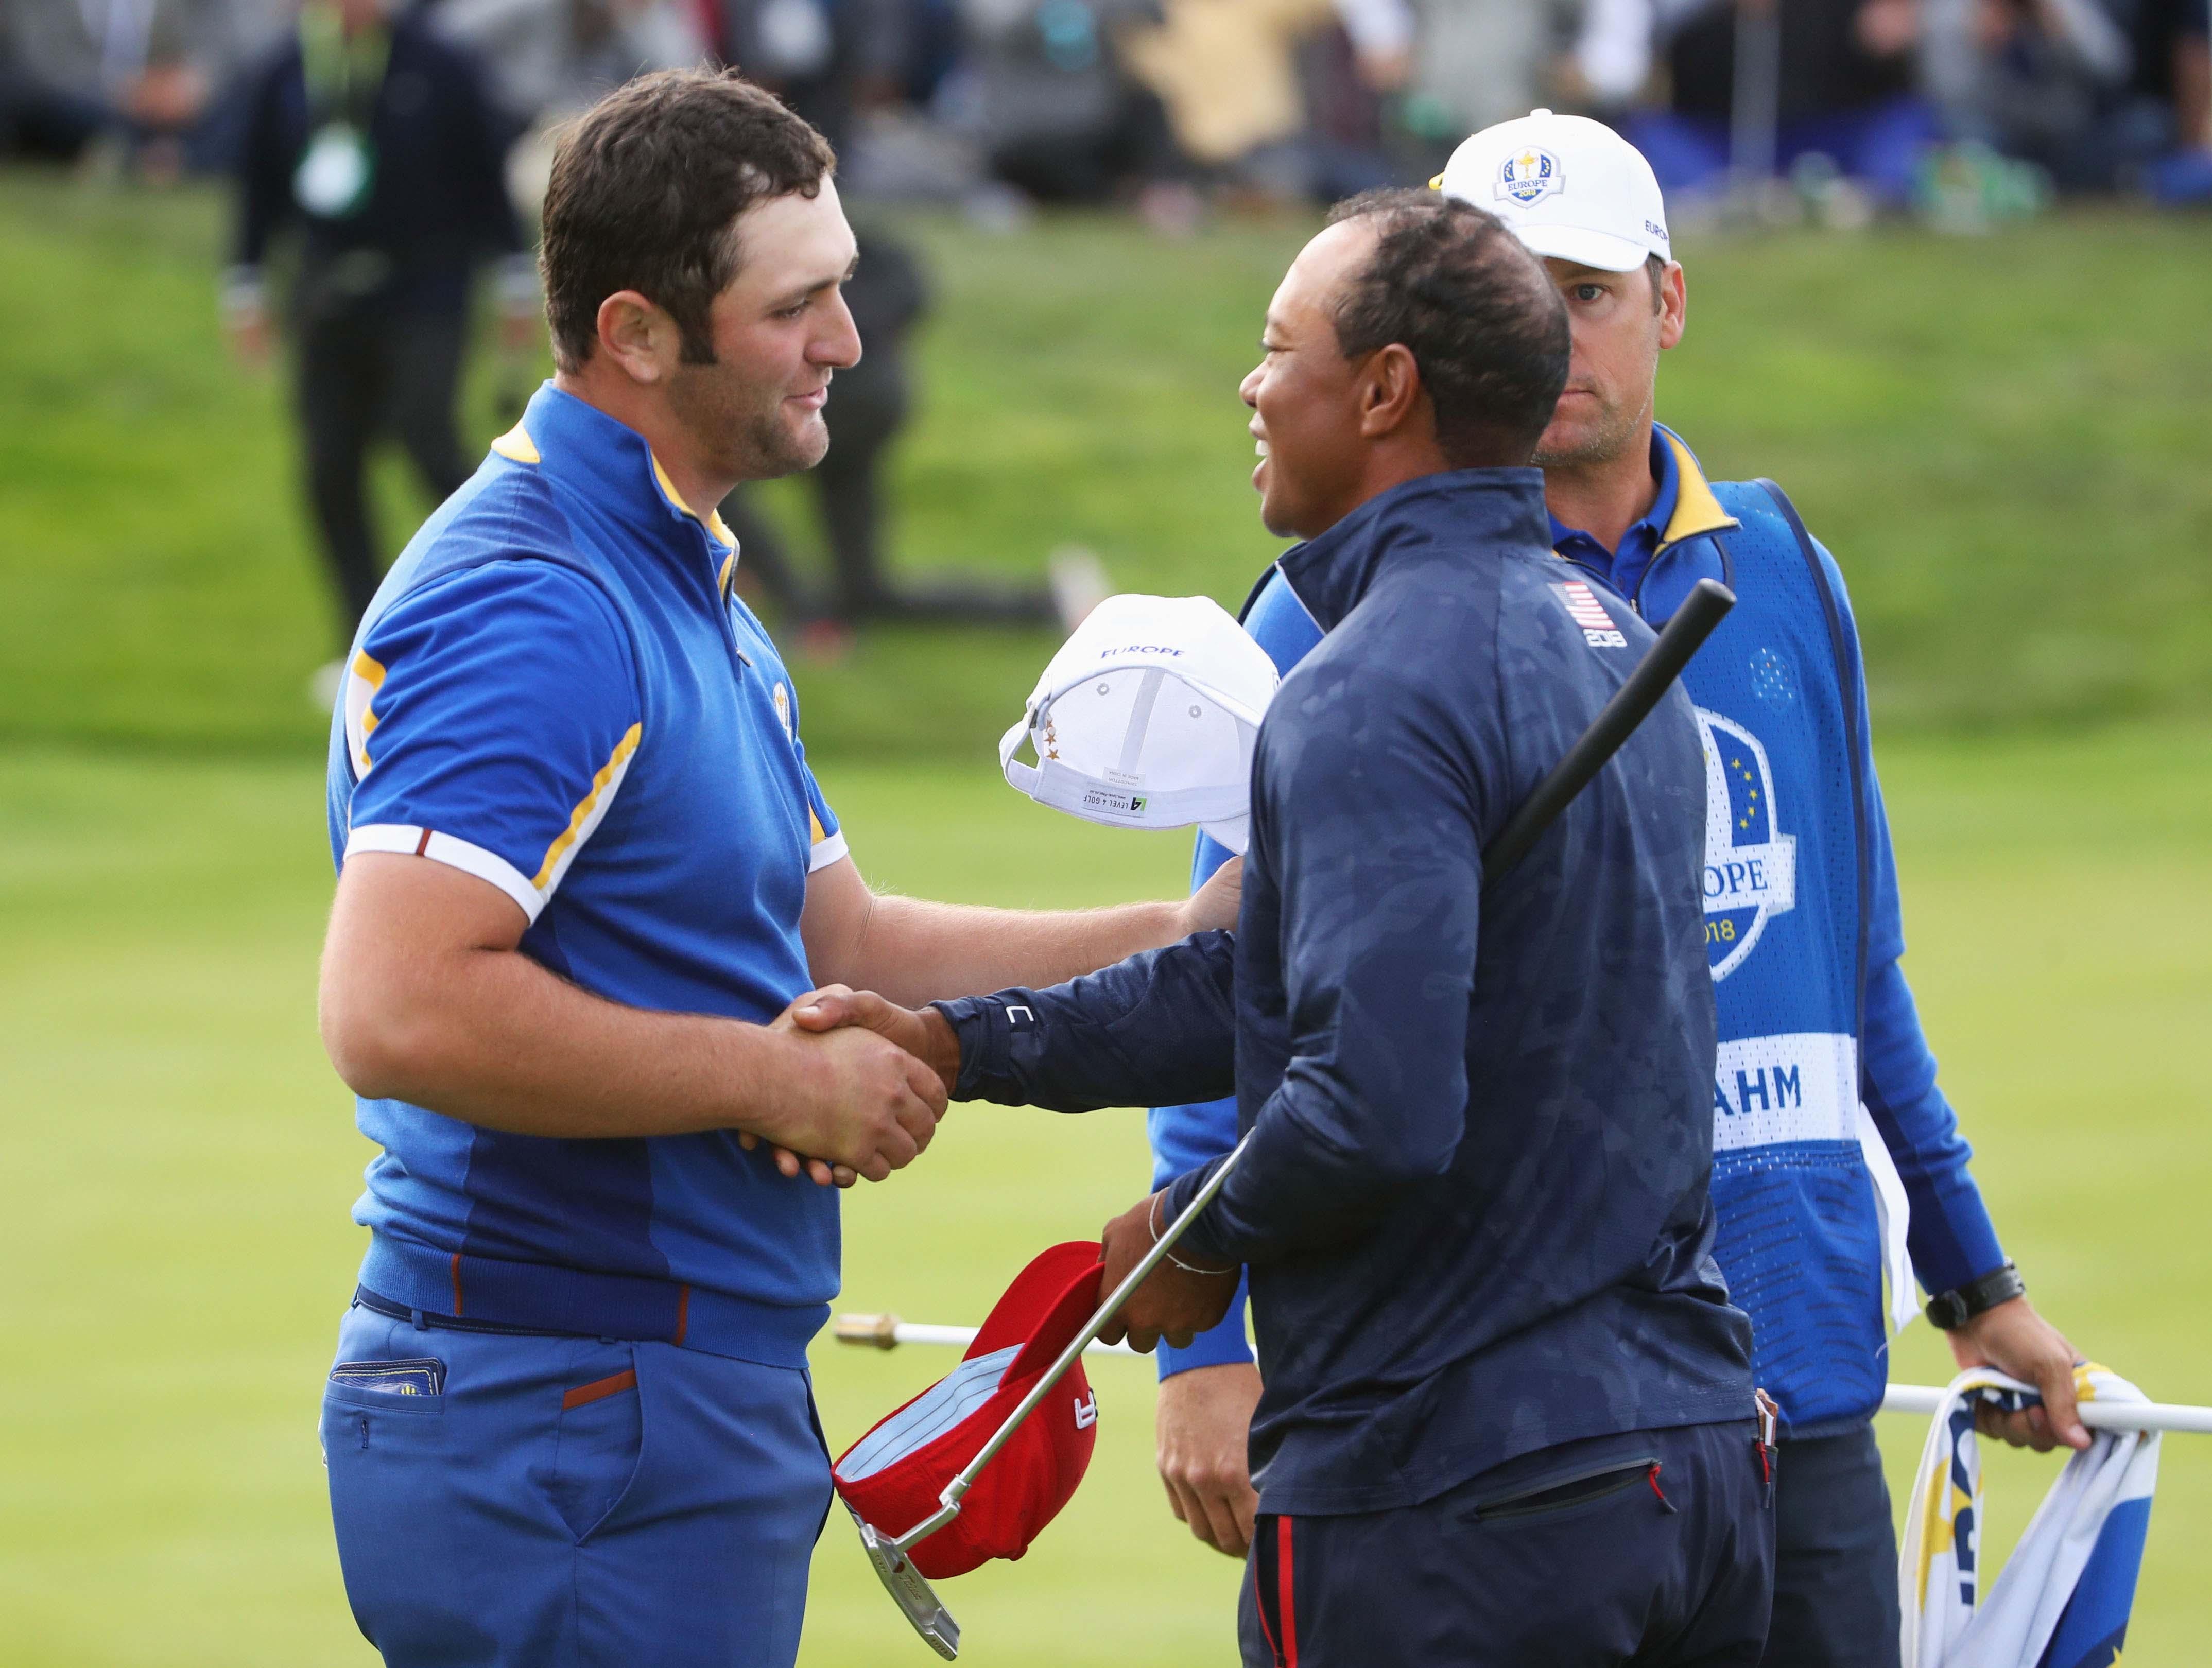 Jon Rahm and Tiger Woods